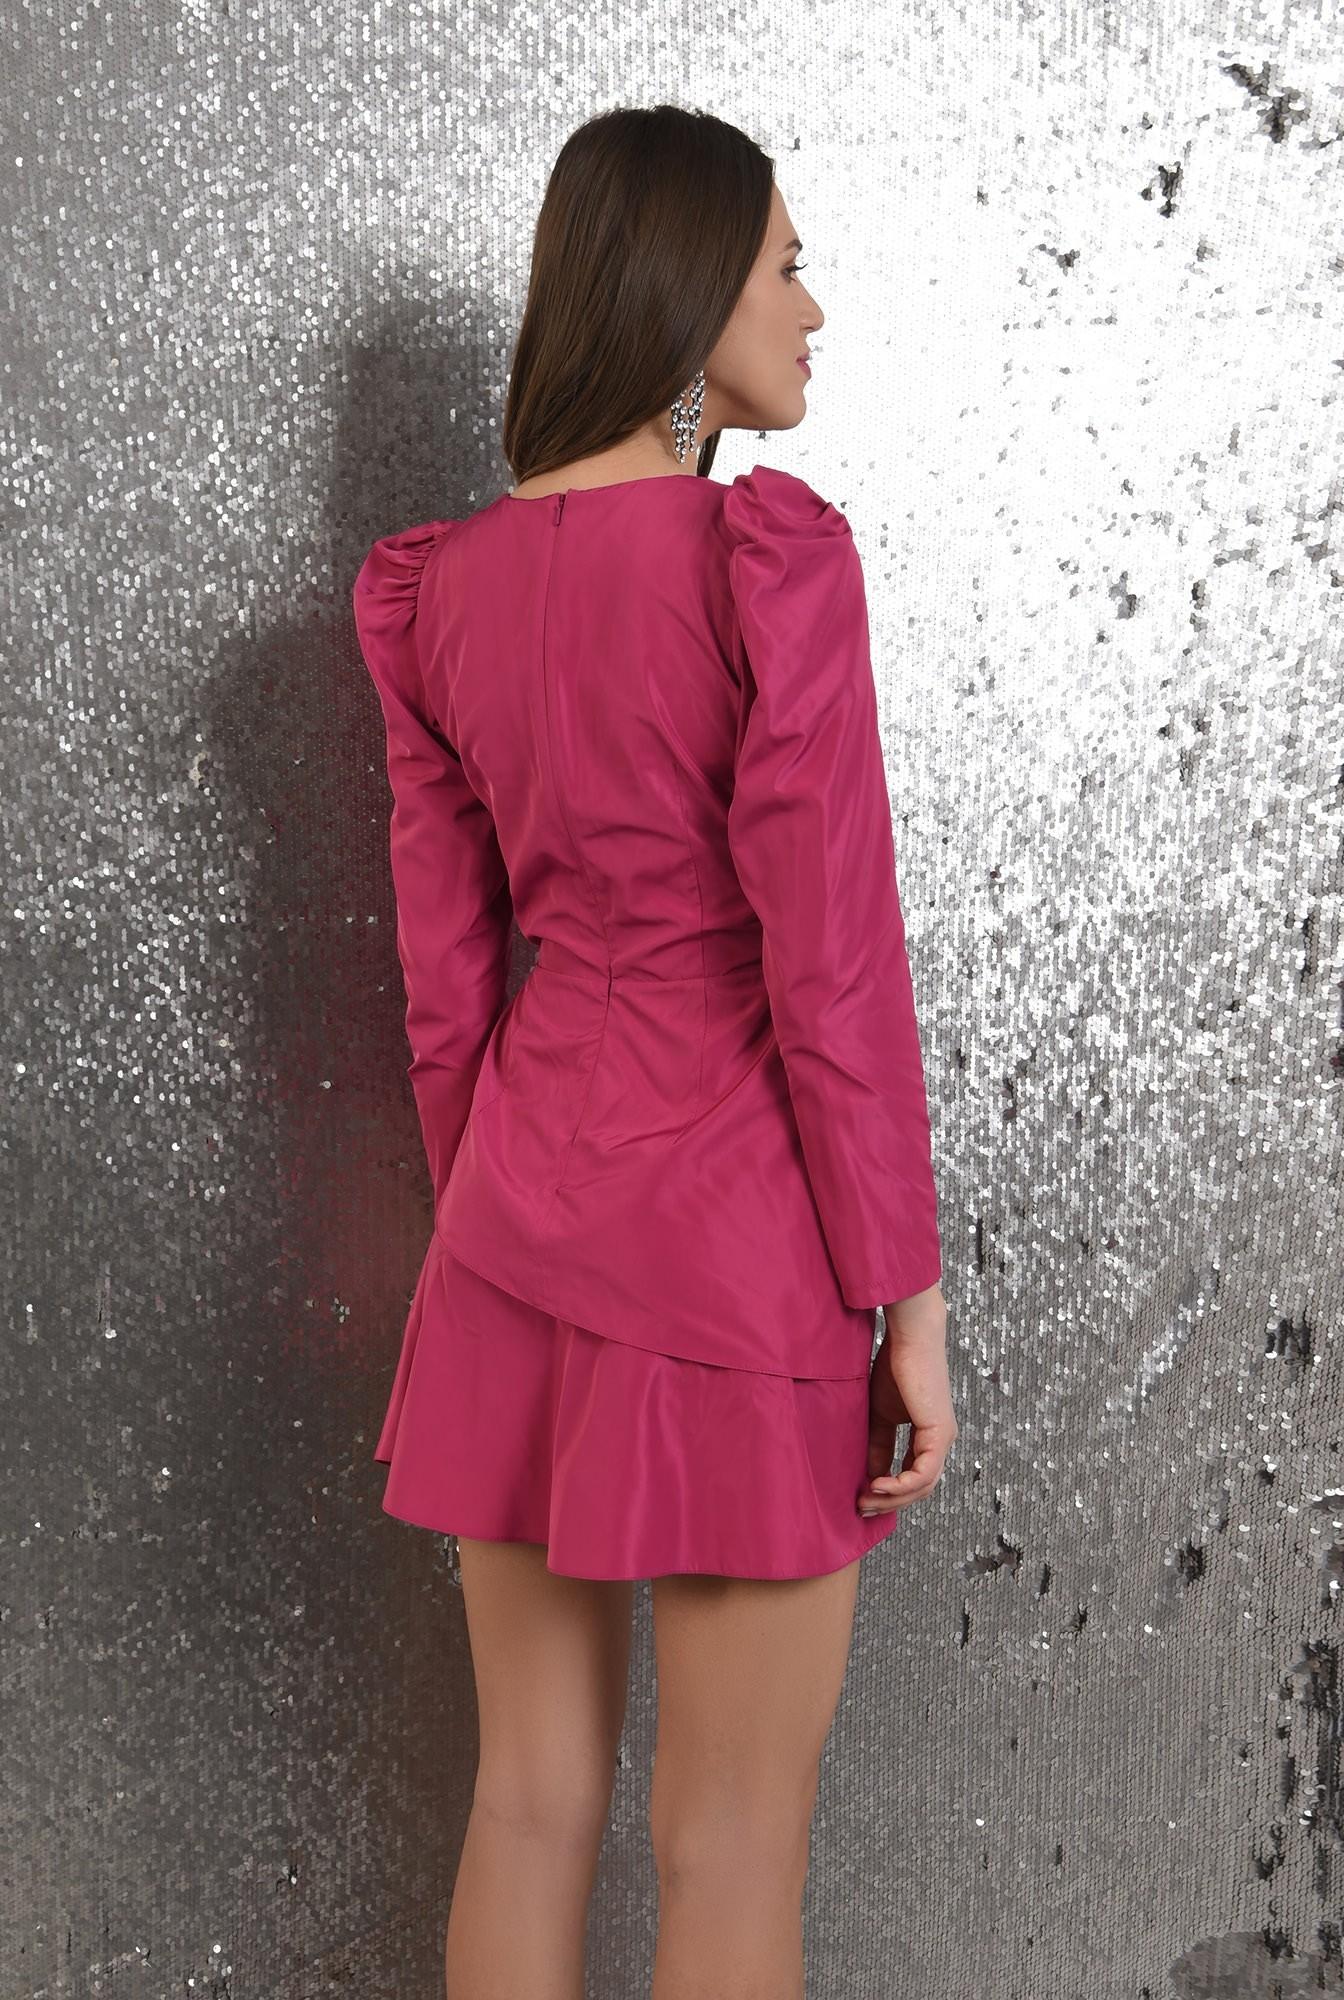 1 - rochie eleganta, petrecuta, cu pliuri decorative, maneci lungi, Poema